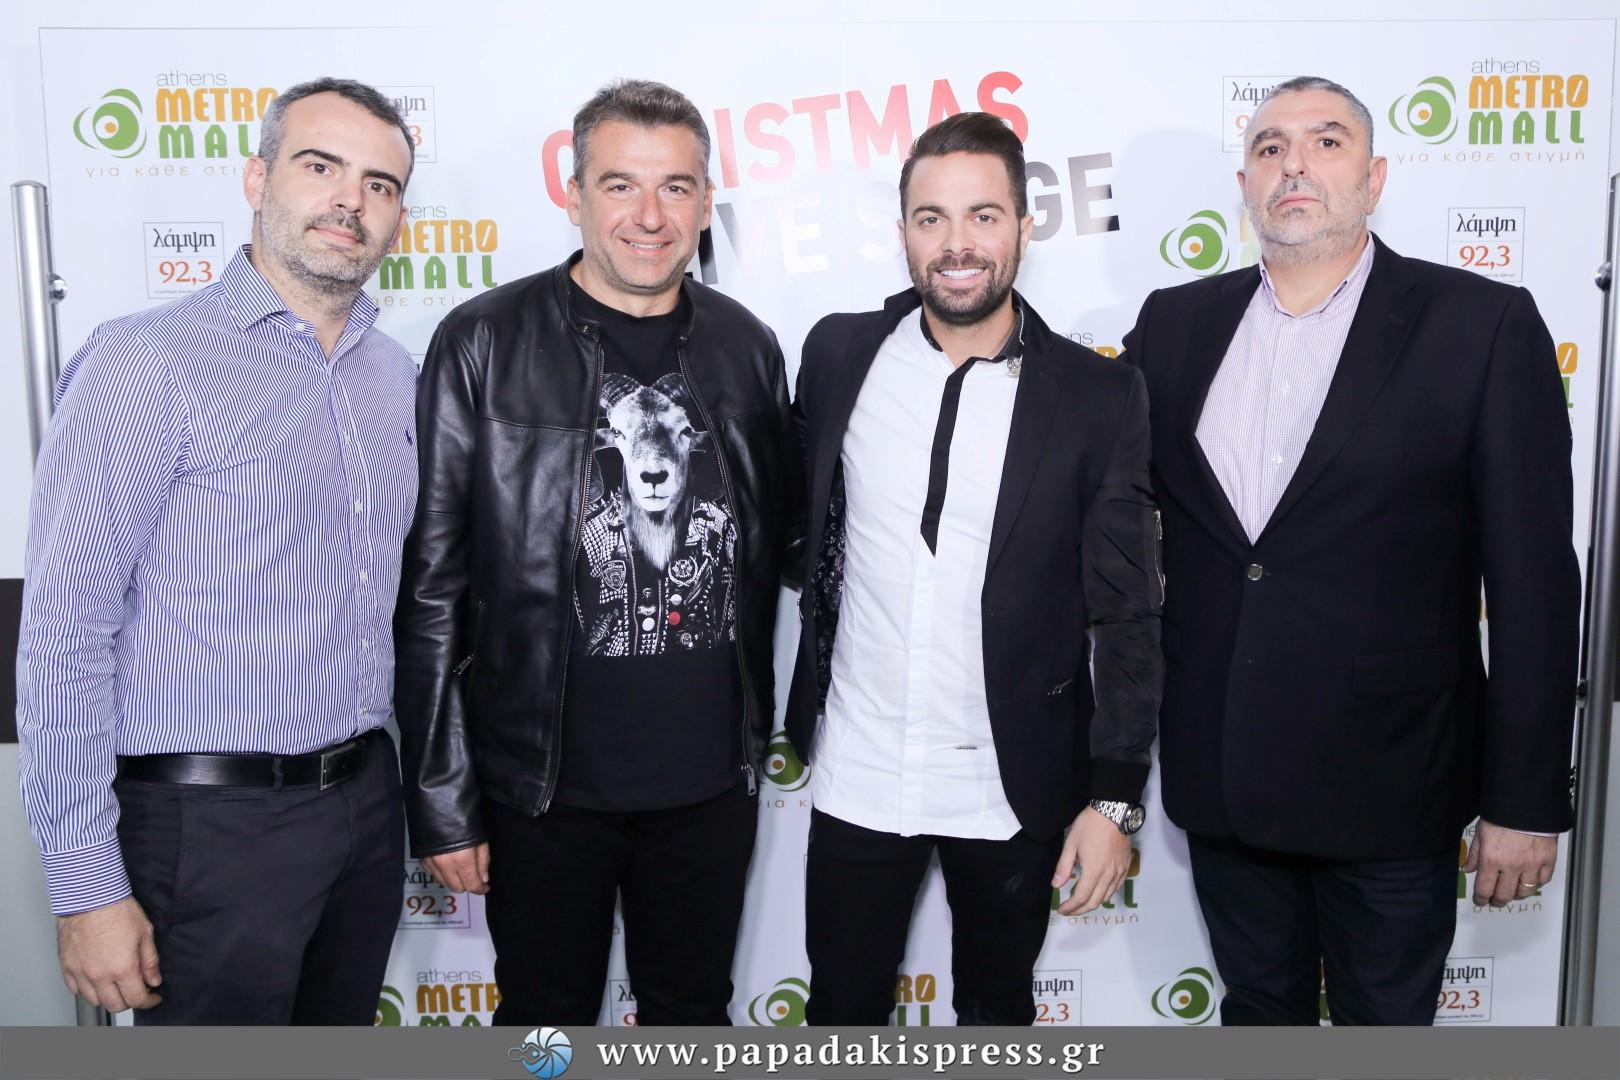 thanos-makris-assistant-manager-athens-metro-mall